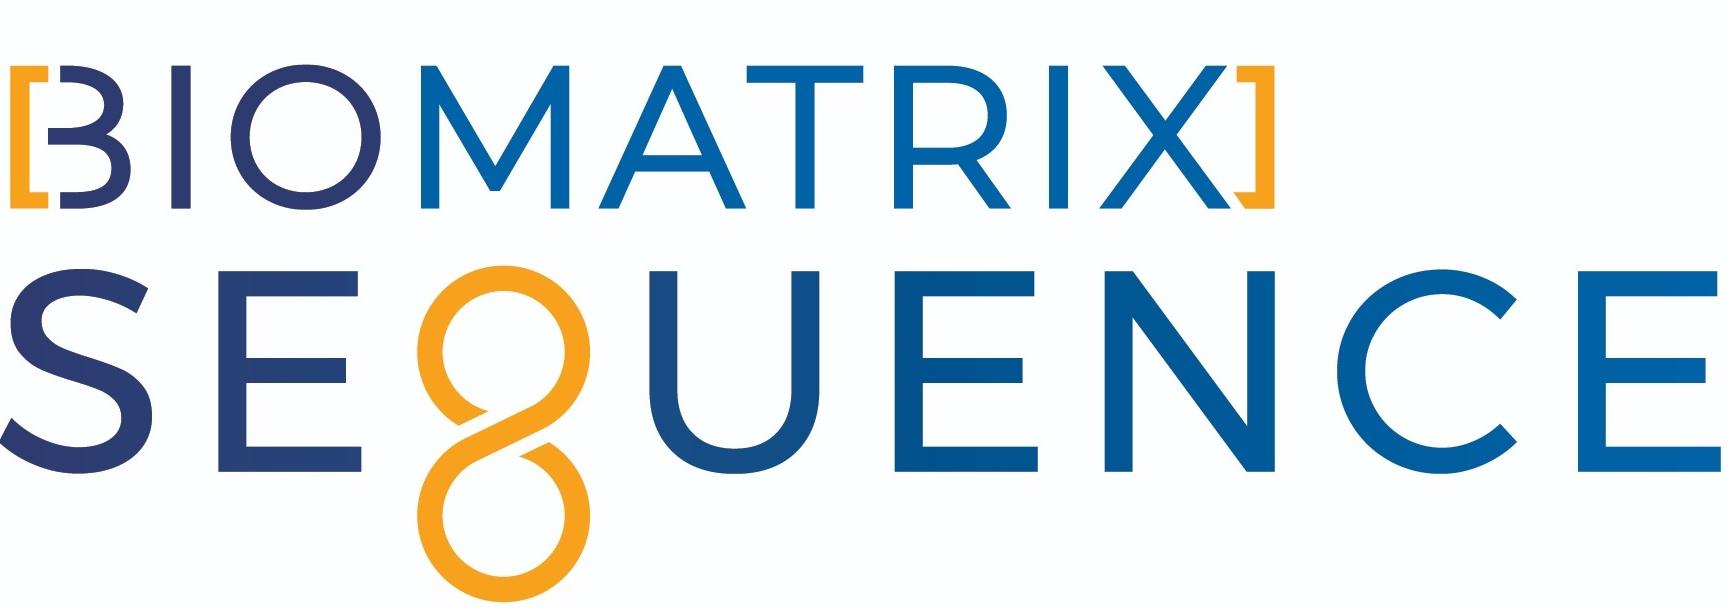 BioMatrix Sequence Branding